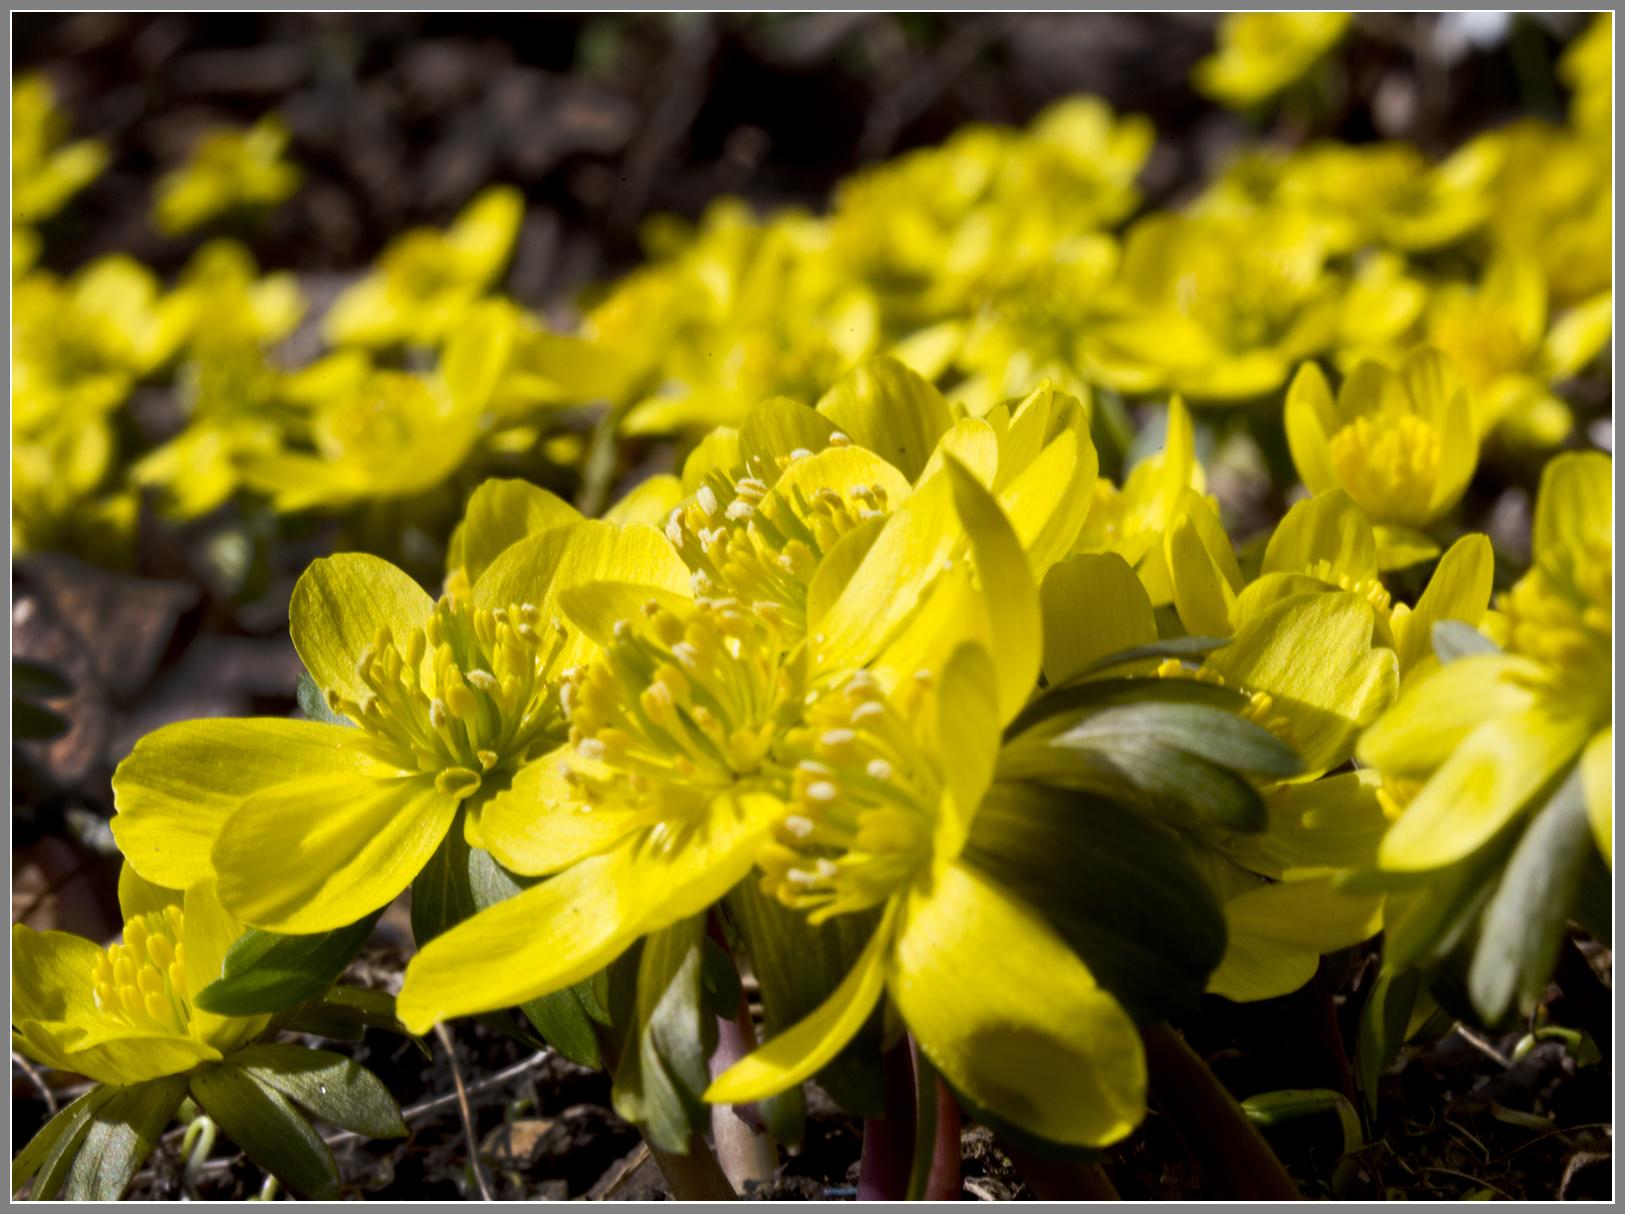 Ranunculus5481jpgs.jpg